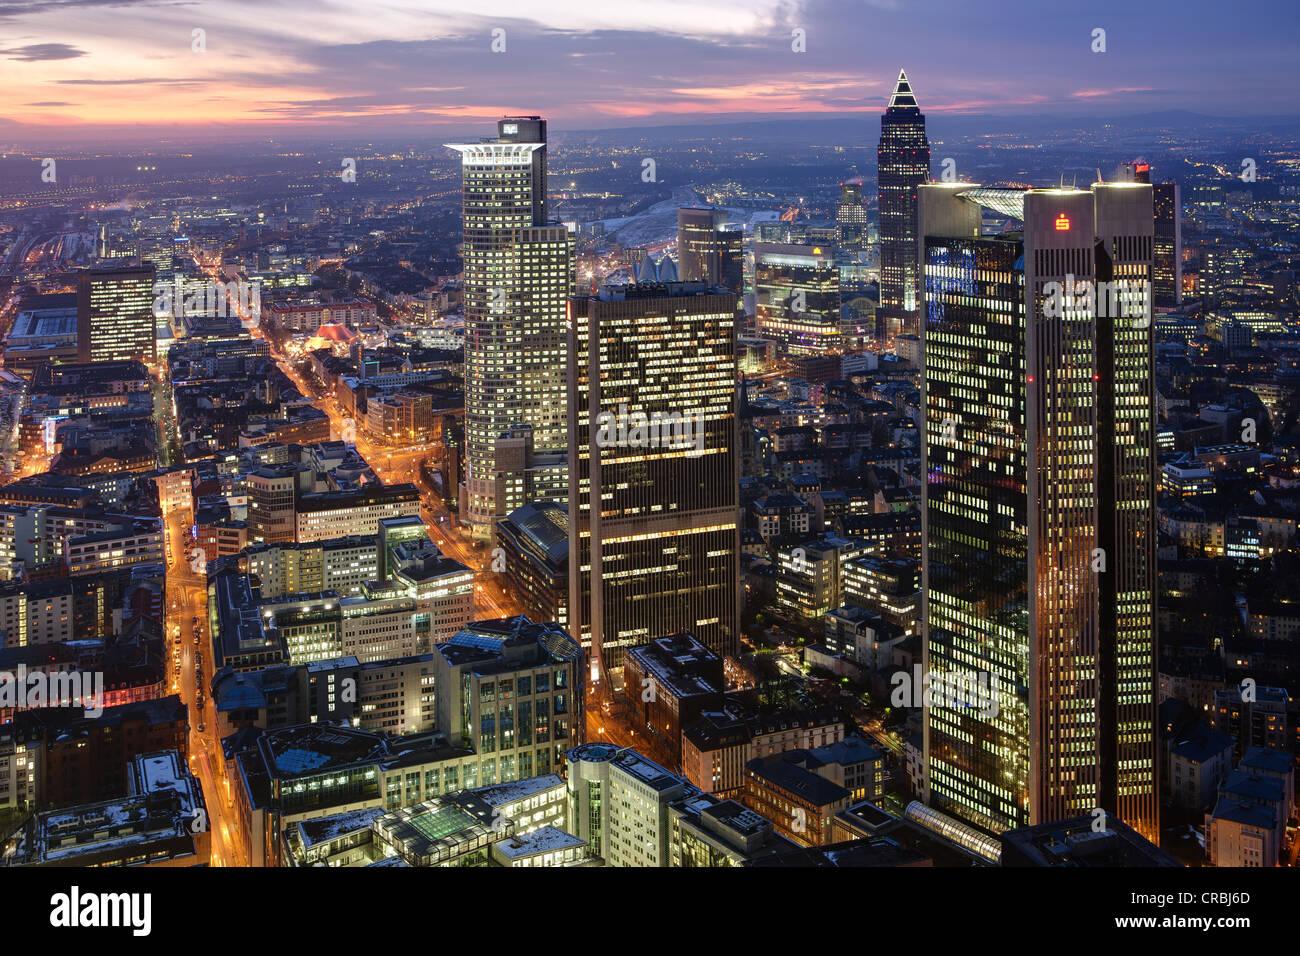 Skyline of Frankfurt, Frankfurt's Westend district, Trianon and Frankfurt Buero Center skyscrapers in front - Stock Image